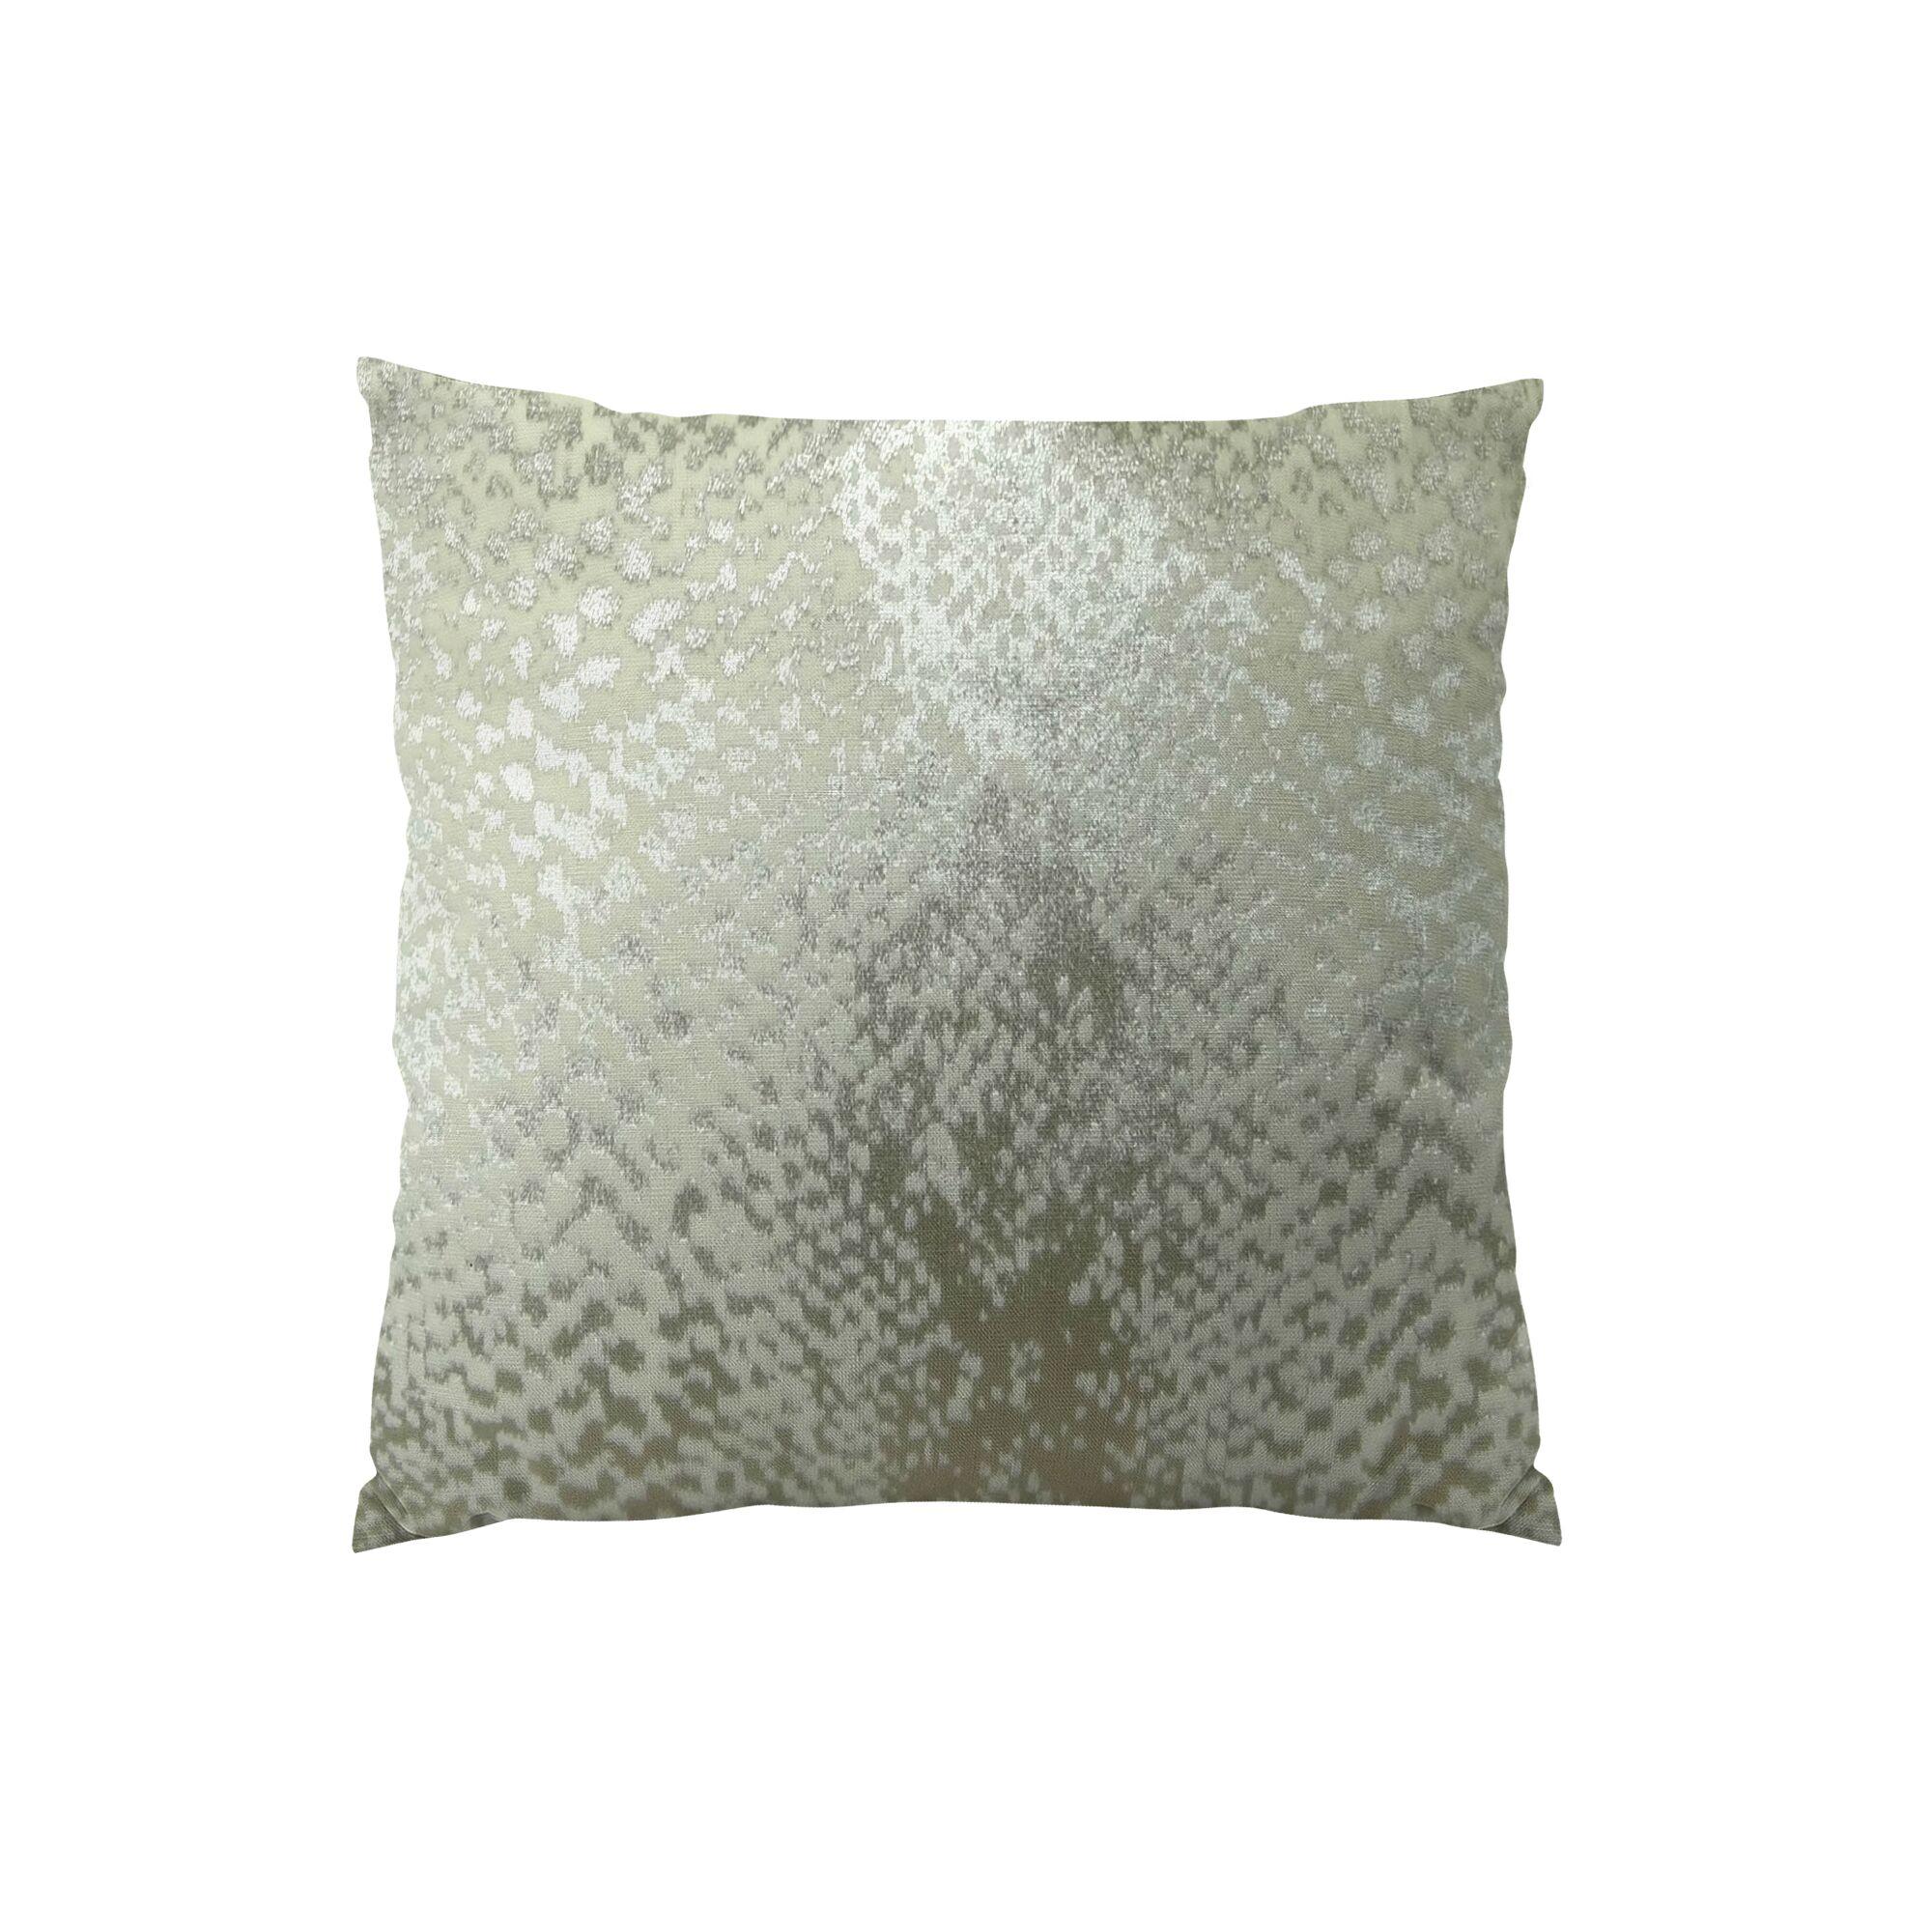 Hidden World Handmade Throw Pillow Color: Silver, Size: 12